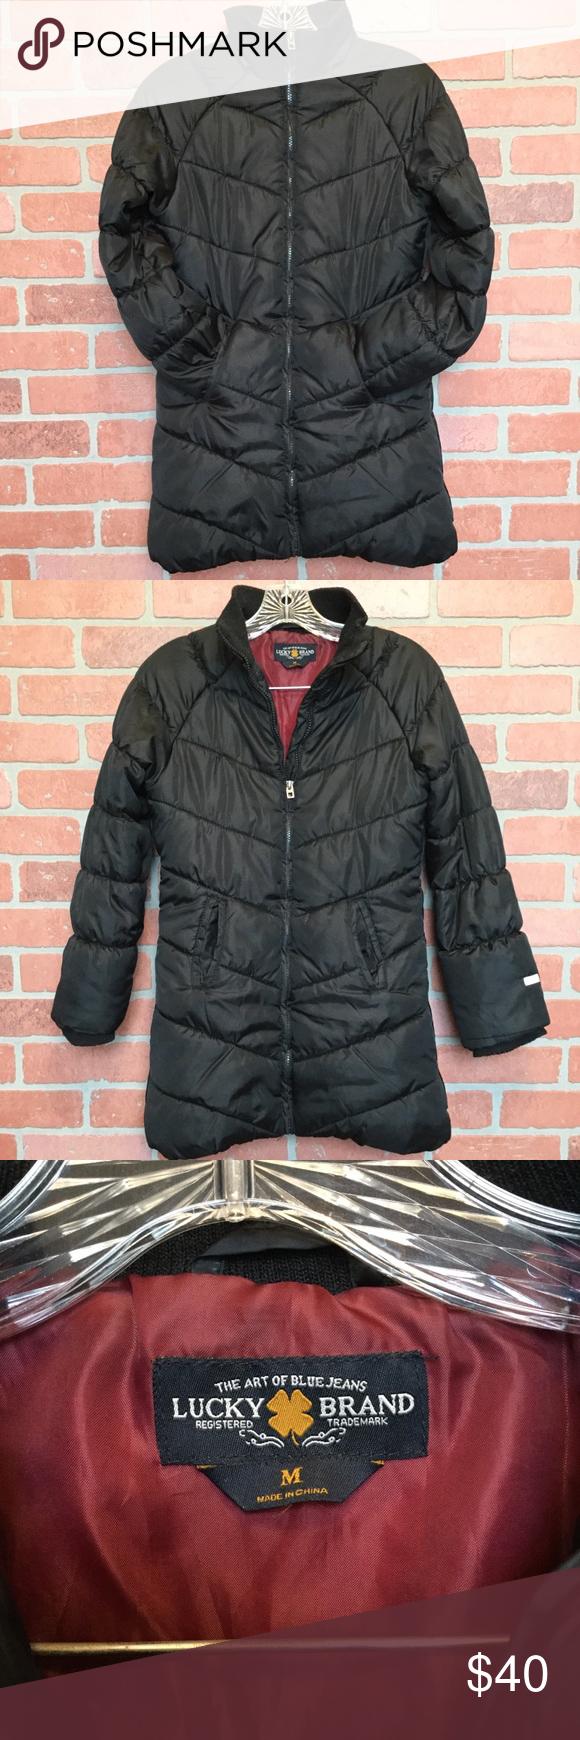 Lucky Brand Women S Med Black Puffer Jacket Coat Black Puffer Jacket Black Puffer Lucky Brand [ 1740 x 580 Pixel ]